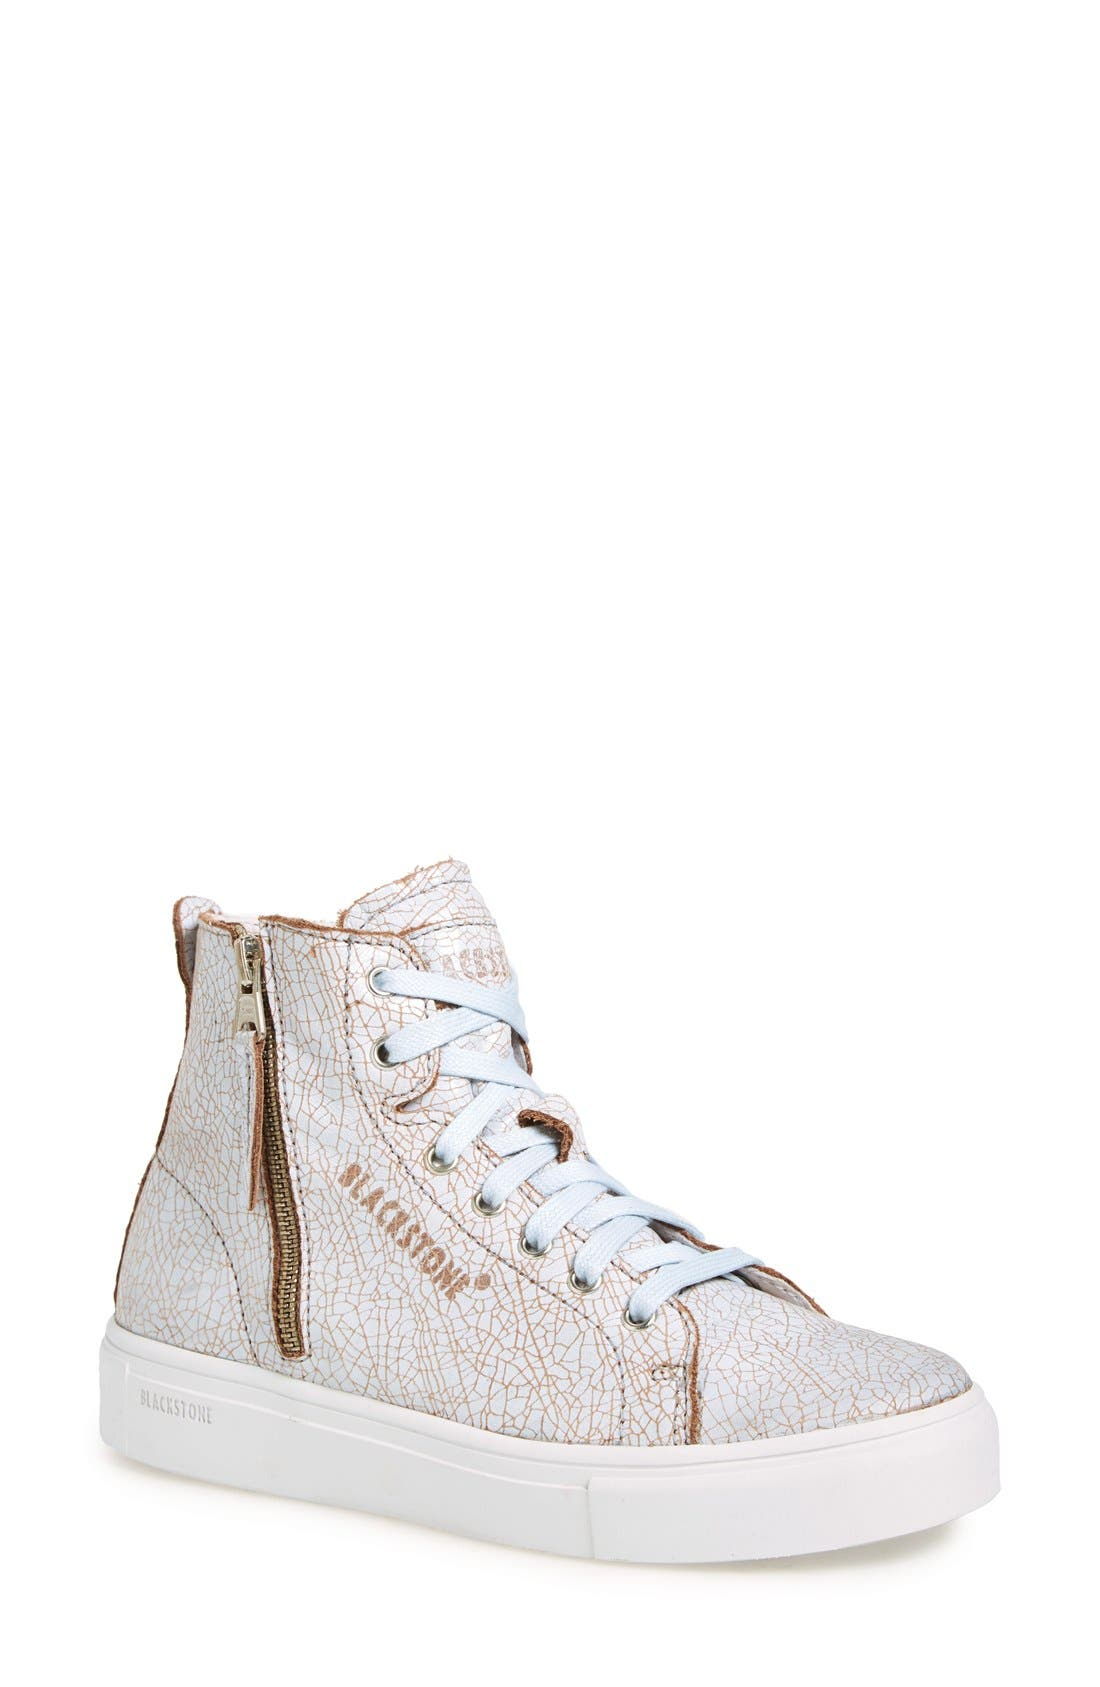 'LL78' Crackled High Top Platform Sneaker,                             Main thumbnail 1, color,                             Hazel/White